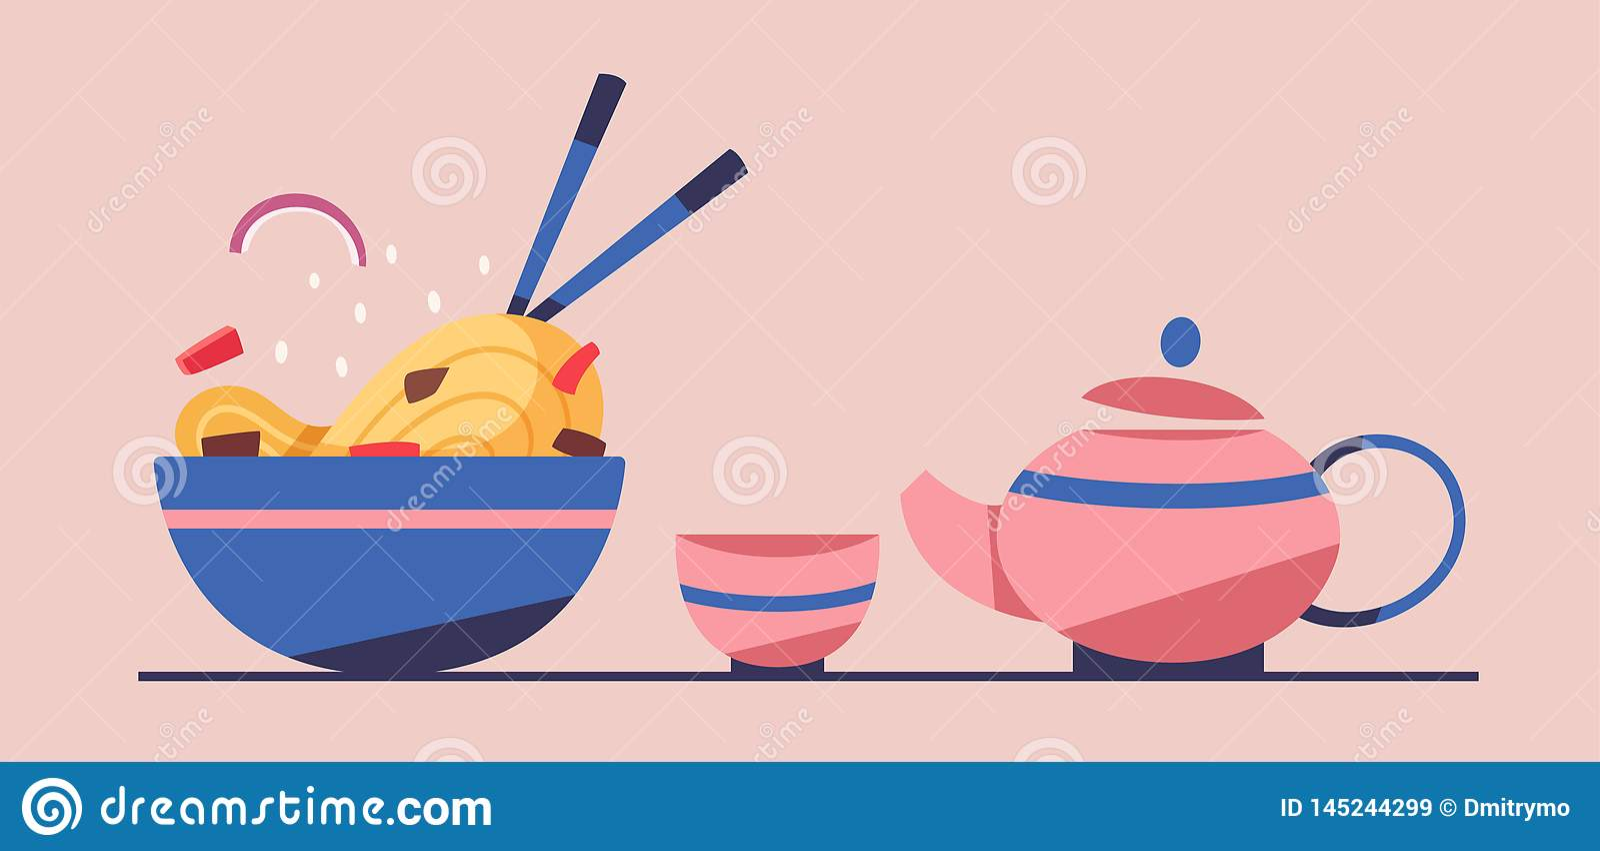 Tasty wok. Chinese cuisine. Flat vector illustration